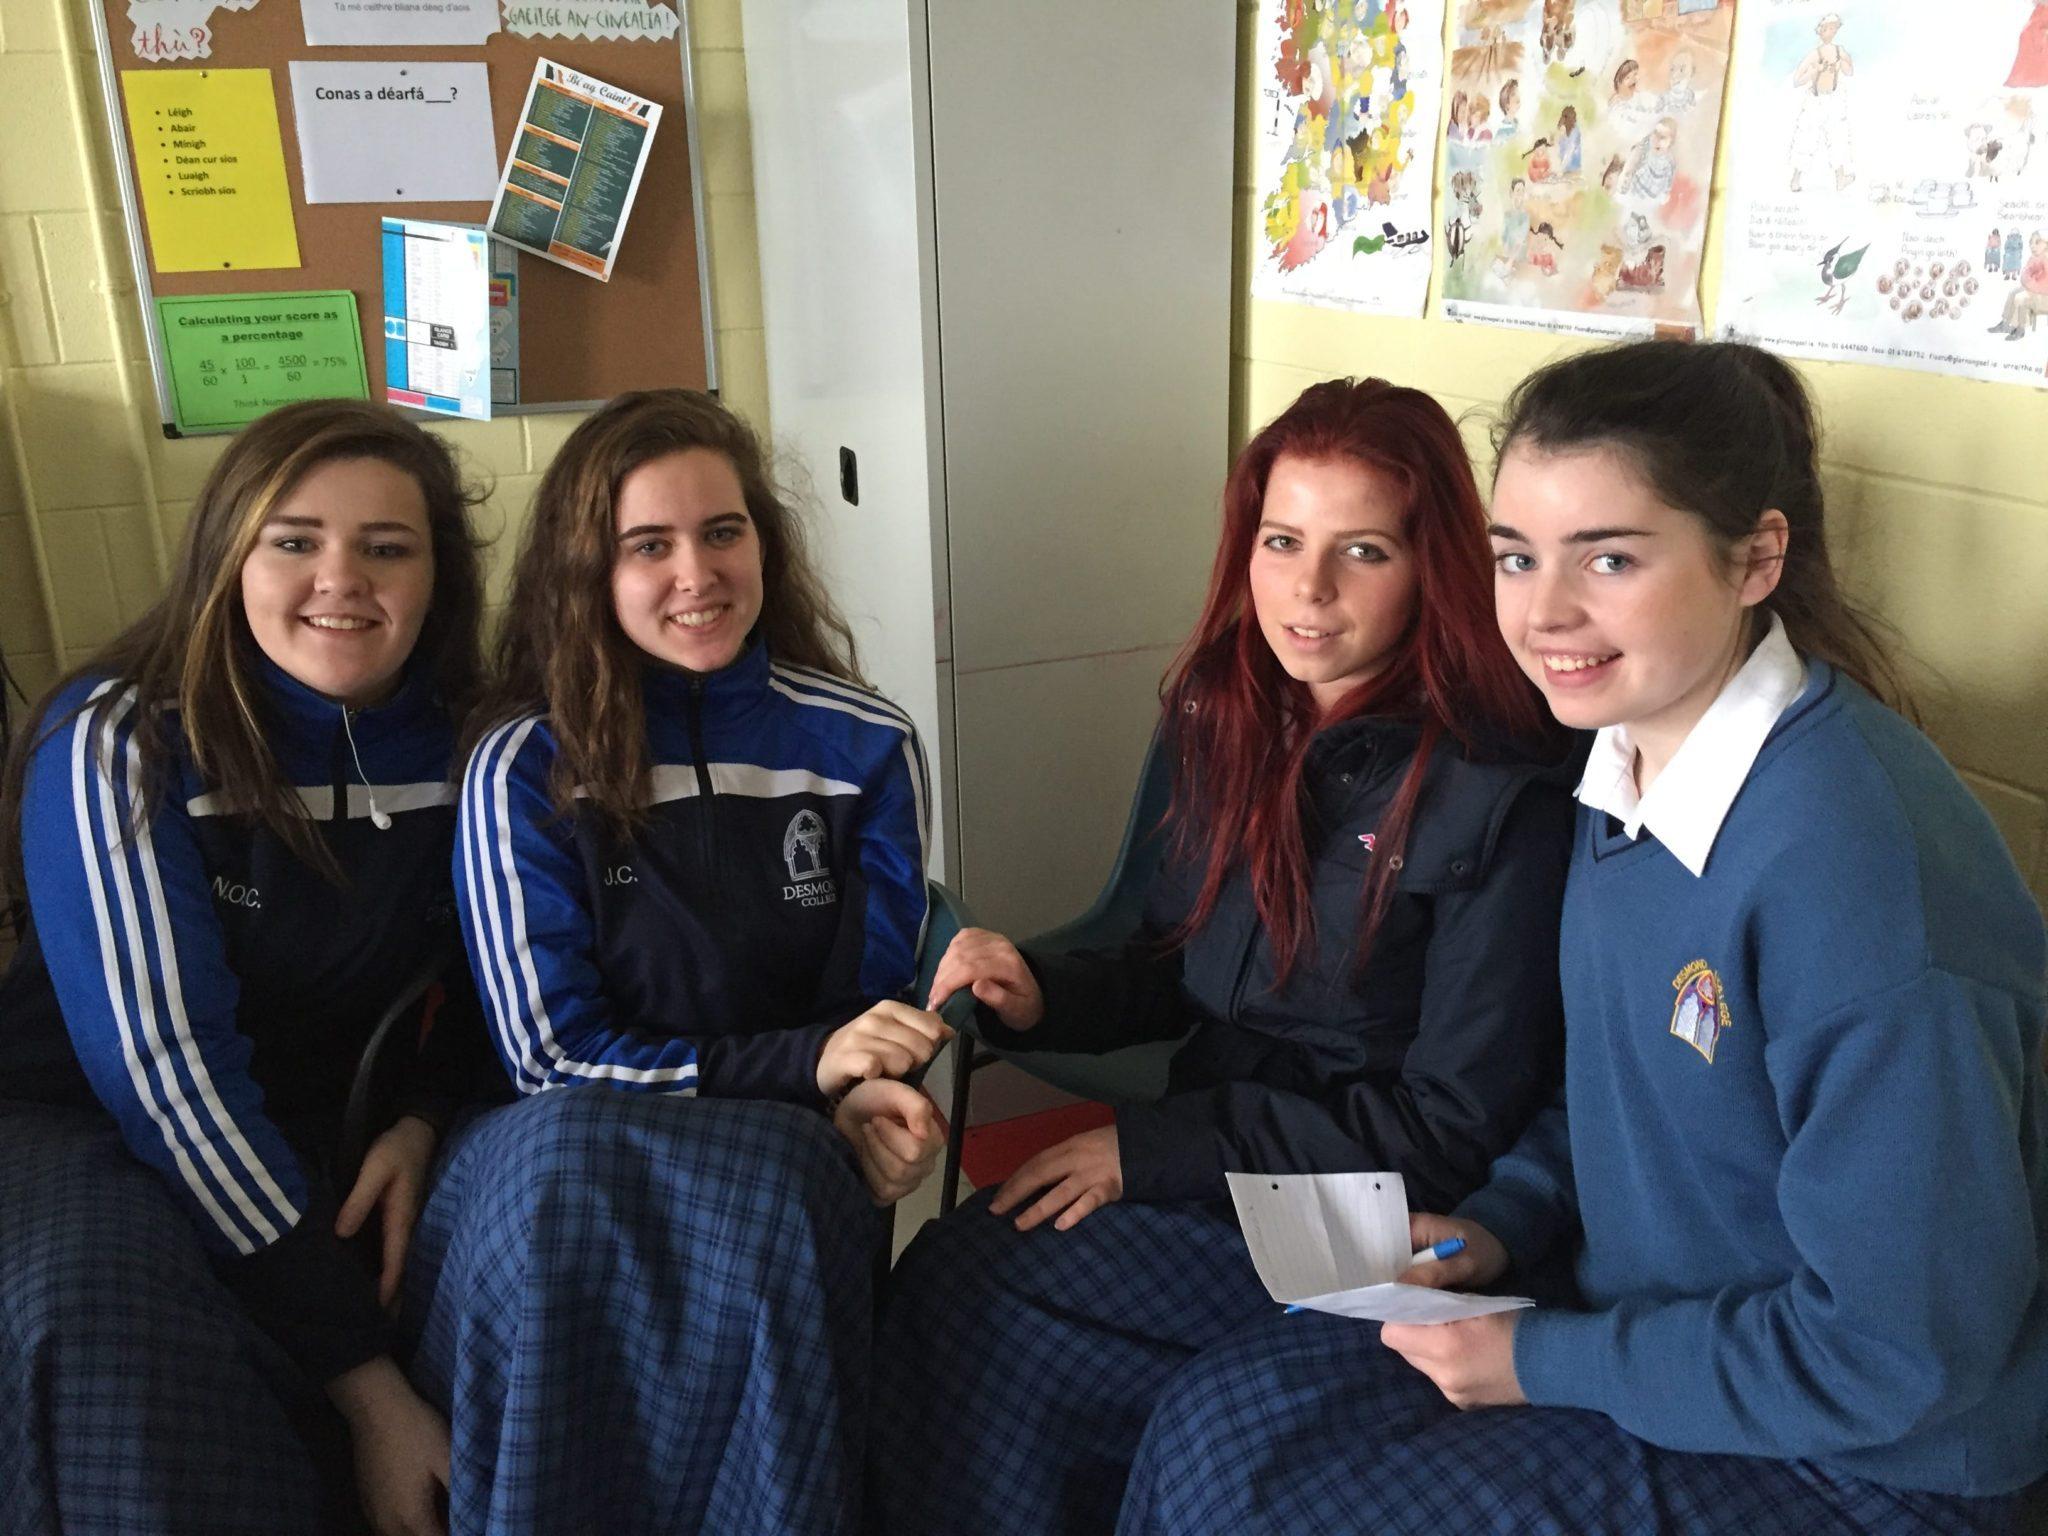 Desmond College Ceili to Celebrate Seachtain na Gaeilge